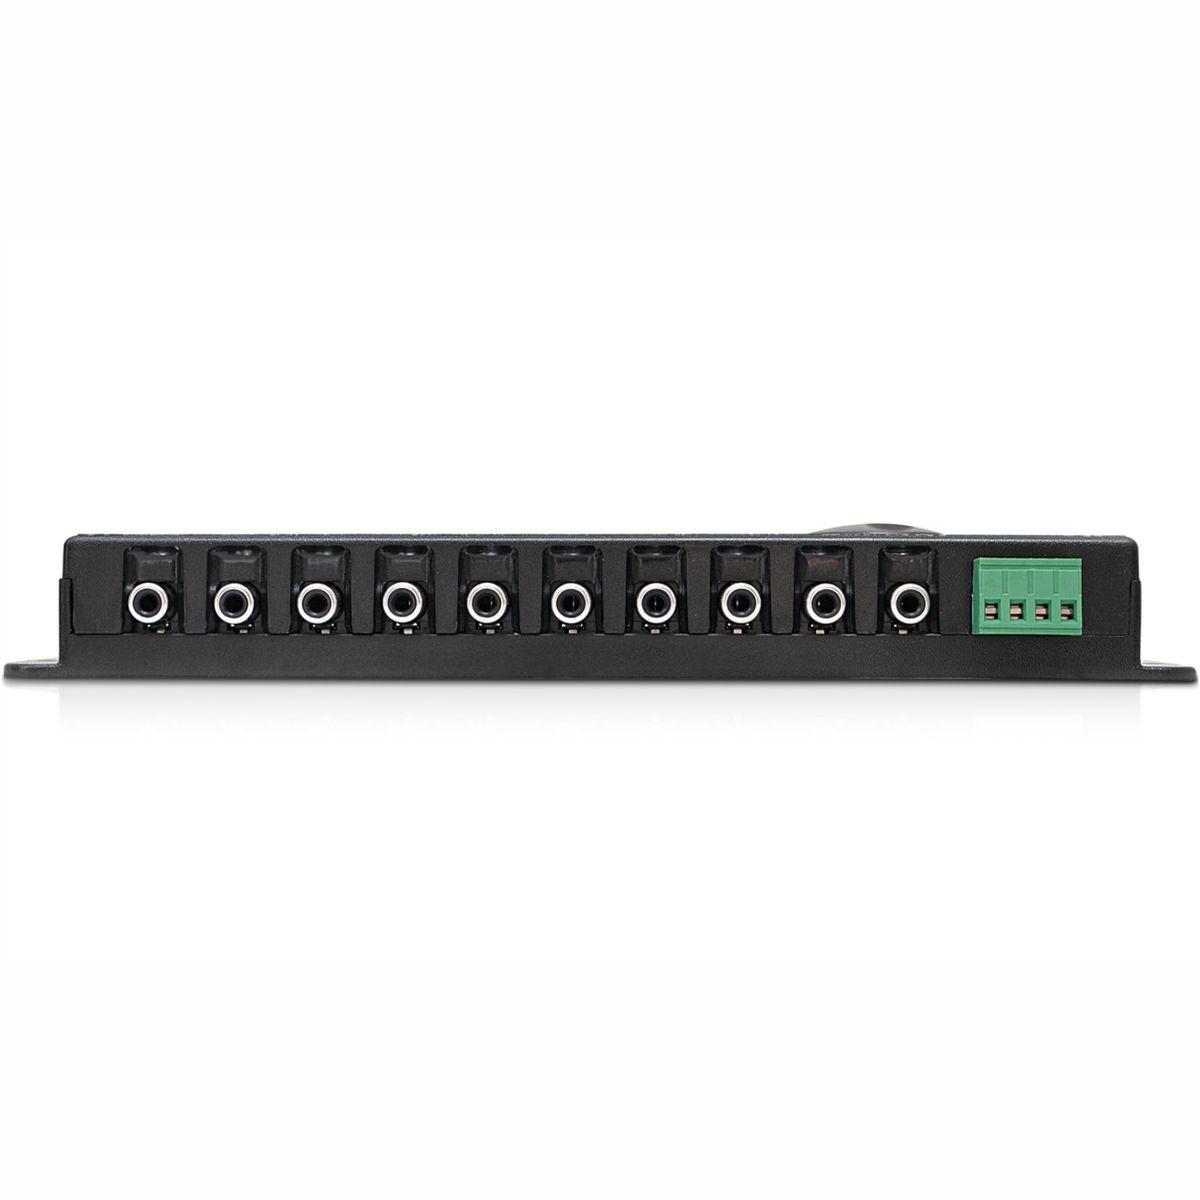 Processador De Áudio Expert Px1 Pro Connect 4 Vias Bluetooth